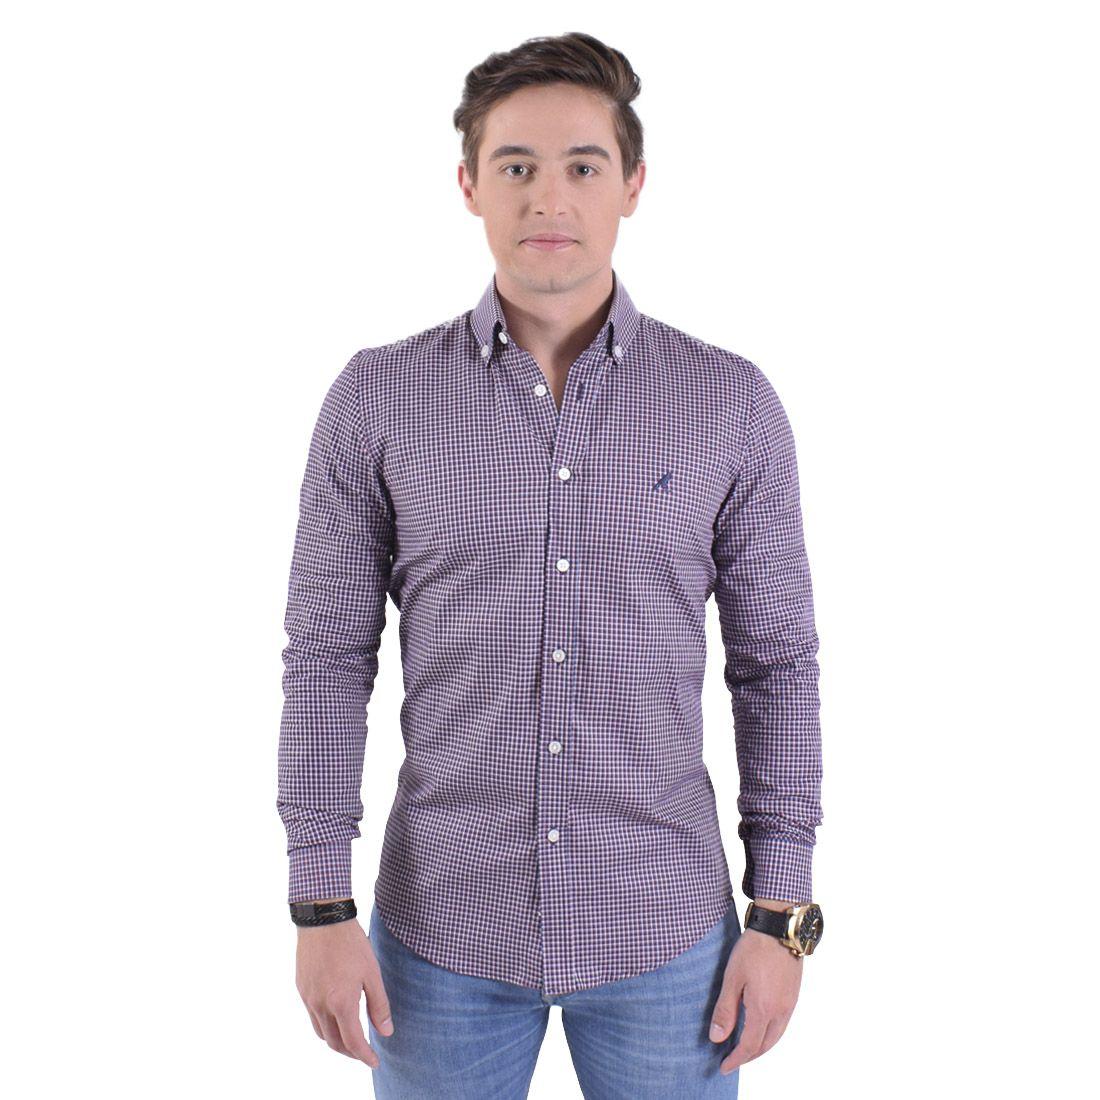 100222 - Camisa Xadrez Masculina Slim Social Purpura - LEVOK